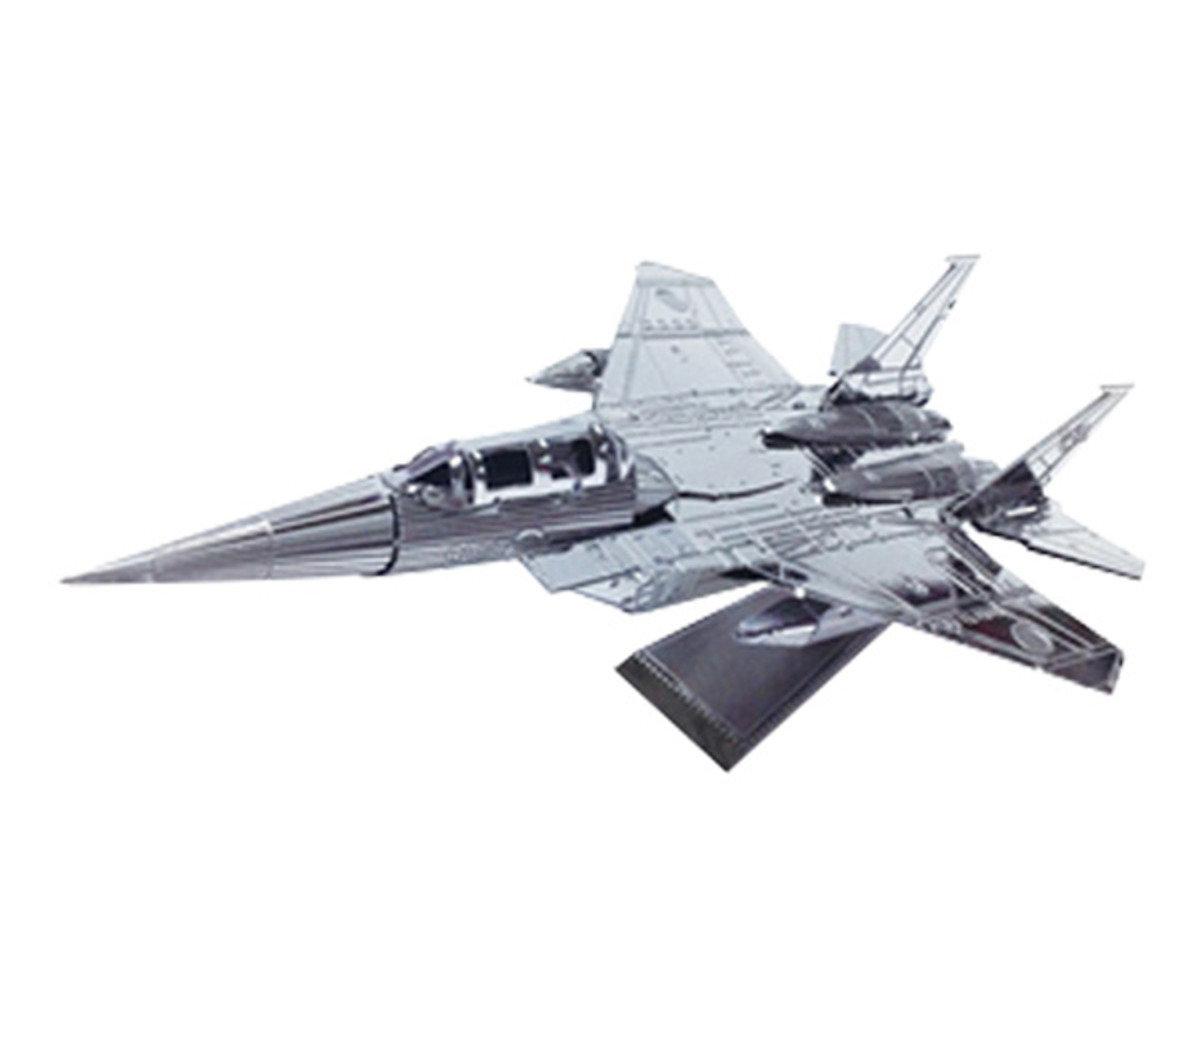 Metallic nano puzzle 金屬拼圖 TMN-42 航空自衛隊 F-15J